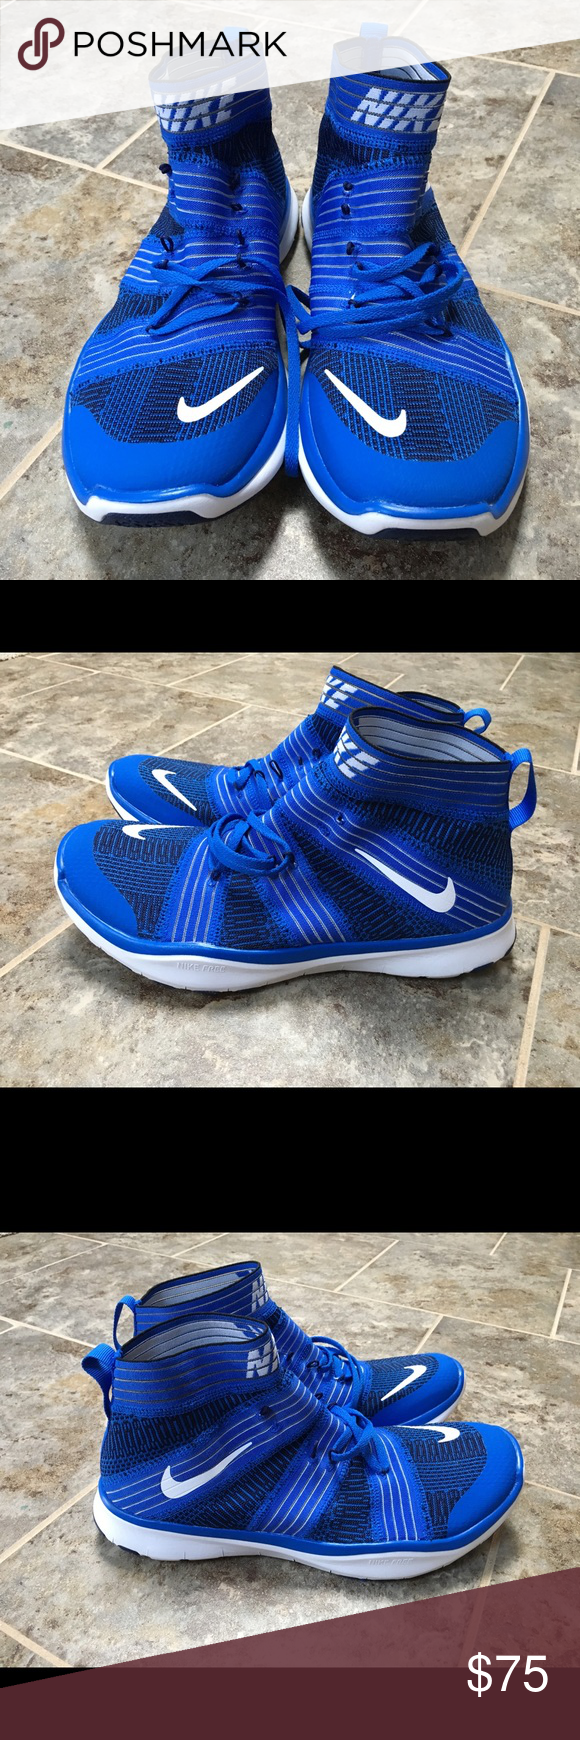 c0d136d5f4d4 Nike Free Train Virtue Training Shoes Size 10.5 Brand new